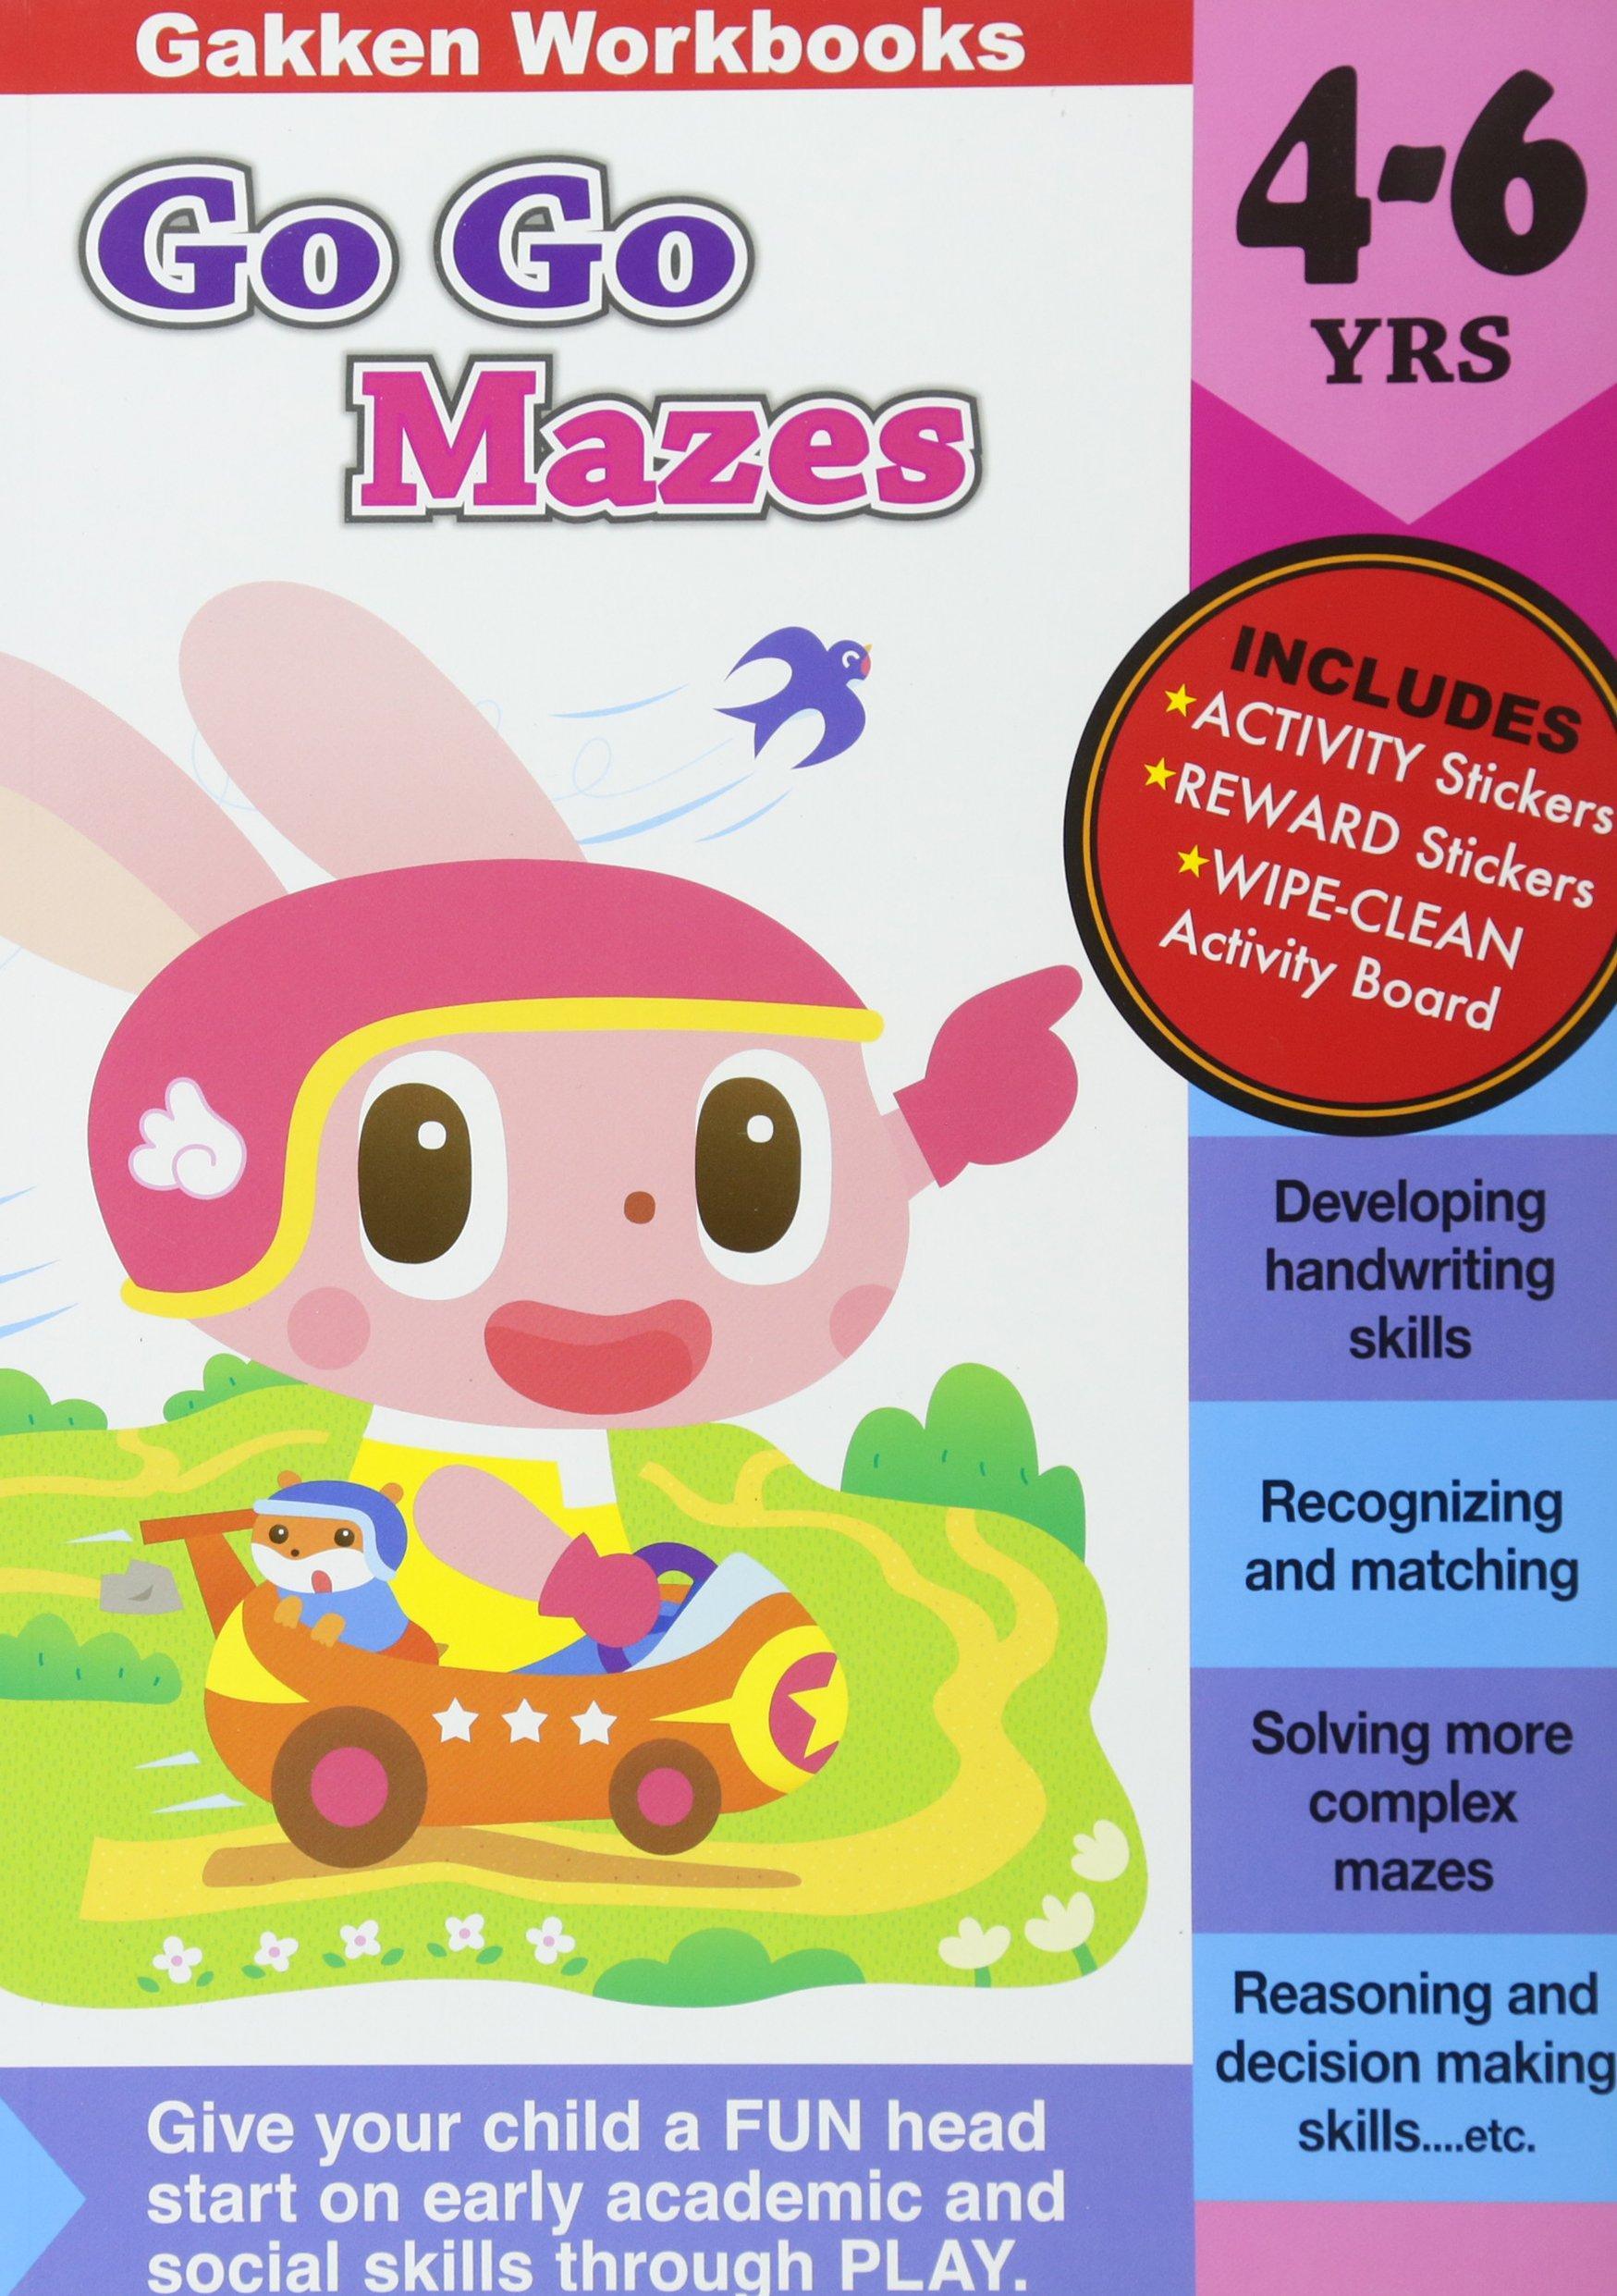 Go Go Mazes 4-6 (Gakken Workbooks)